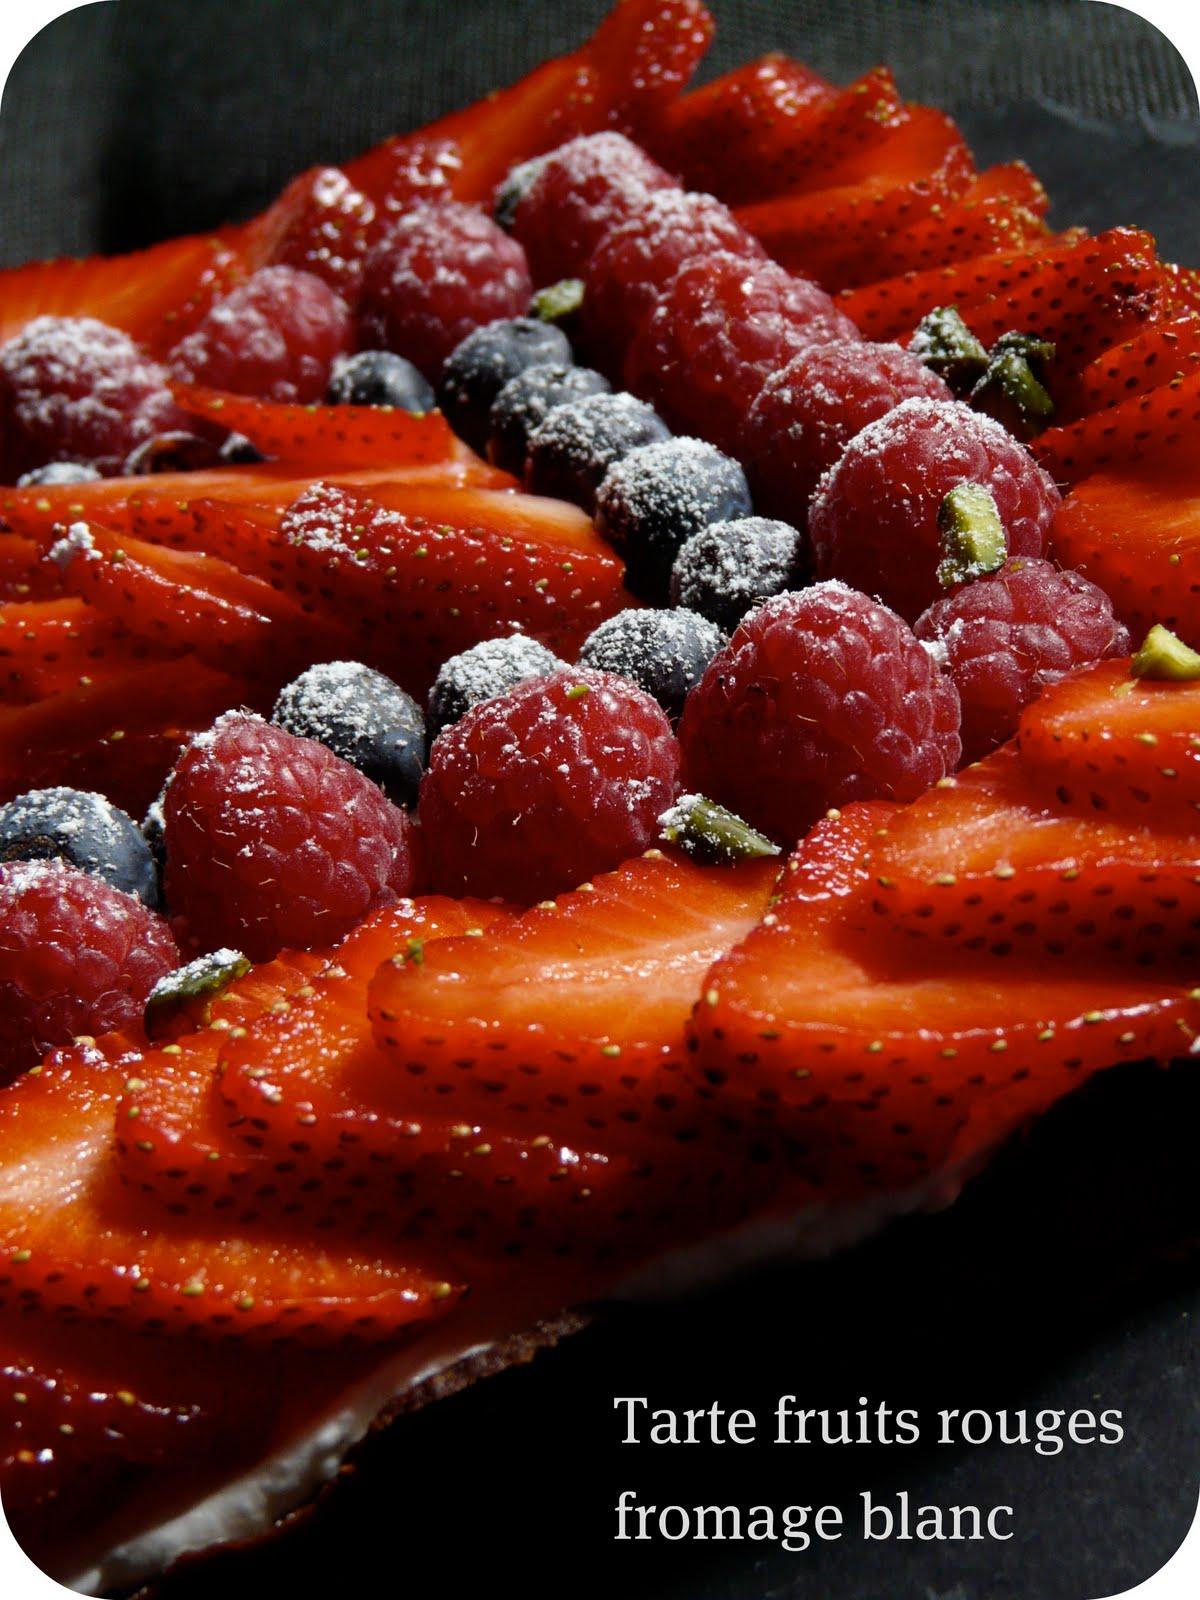 on dine chez nanou tarte fra cheur aux fruits rouges et fromage blanc. Black Bedroom Furniture Sets. Home Design Ideas